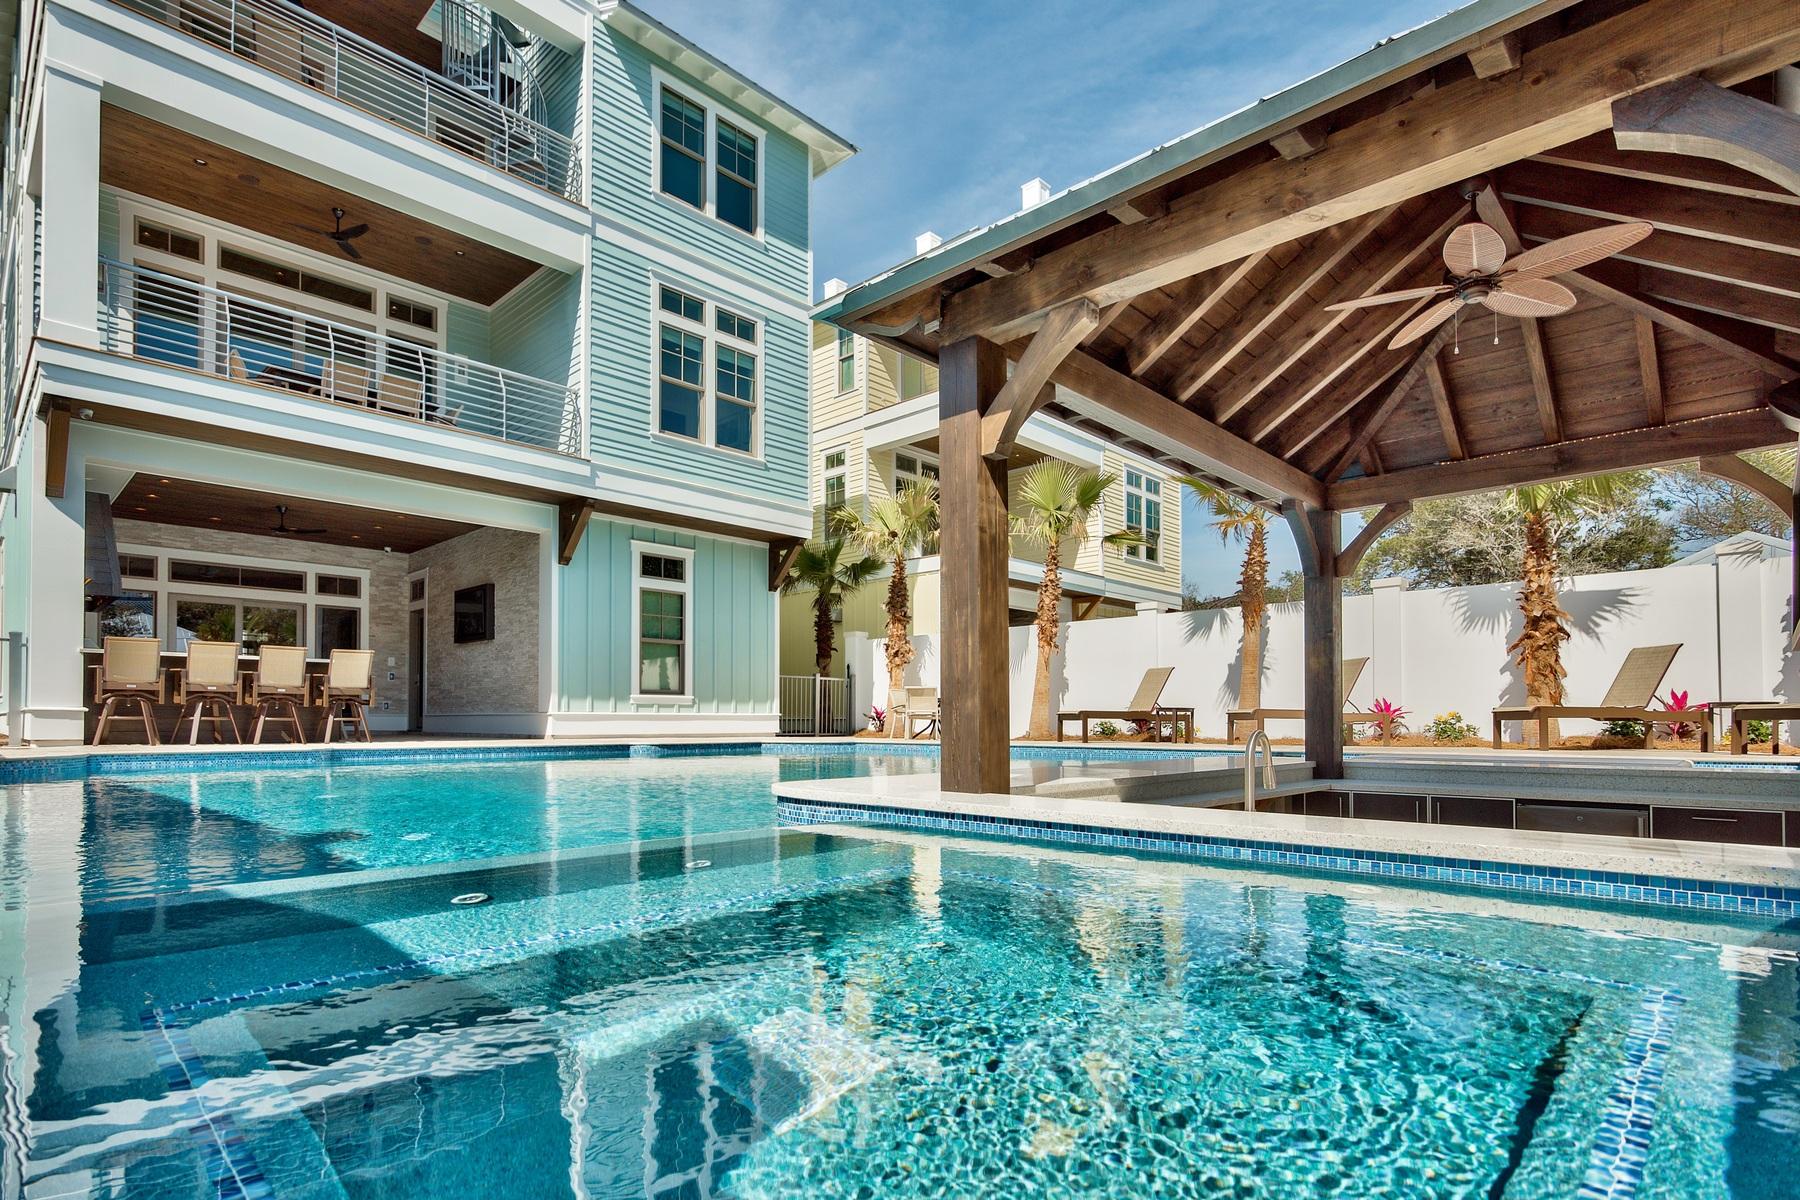 獨棟家庭住宅 為 出售 在 CRYSTAL BEACH CONTEMPORARY VACATION RENTAL MAGNET 69 Dolphin Street Destin, 佛羅里達州, 32541 美國